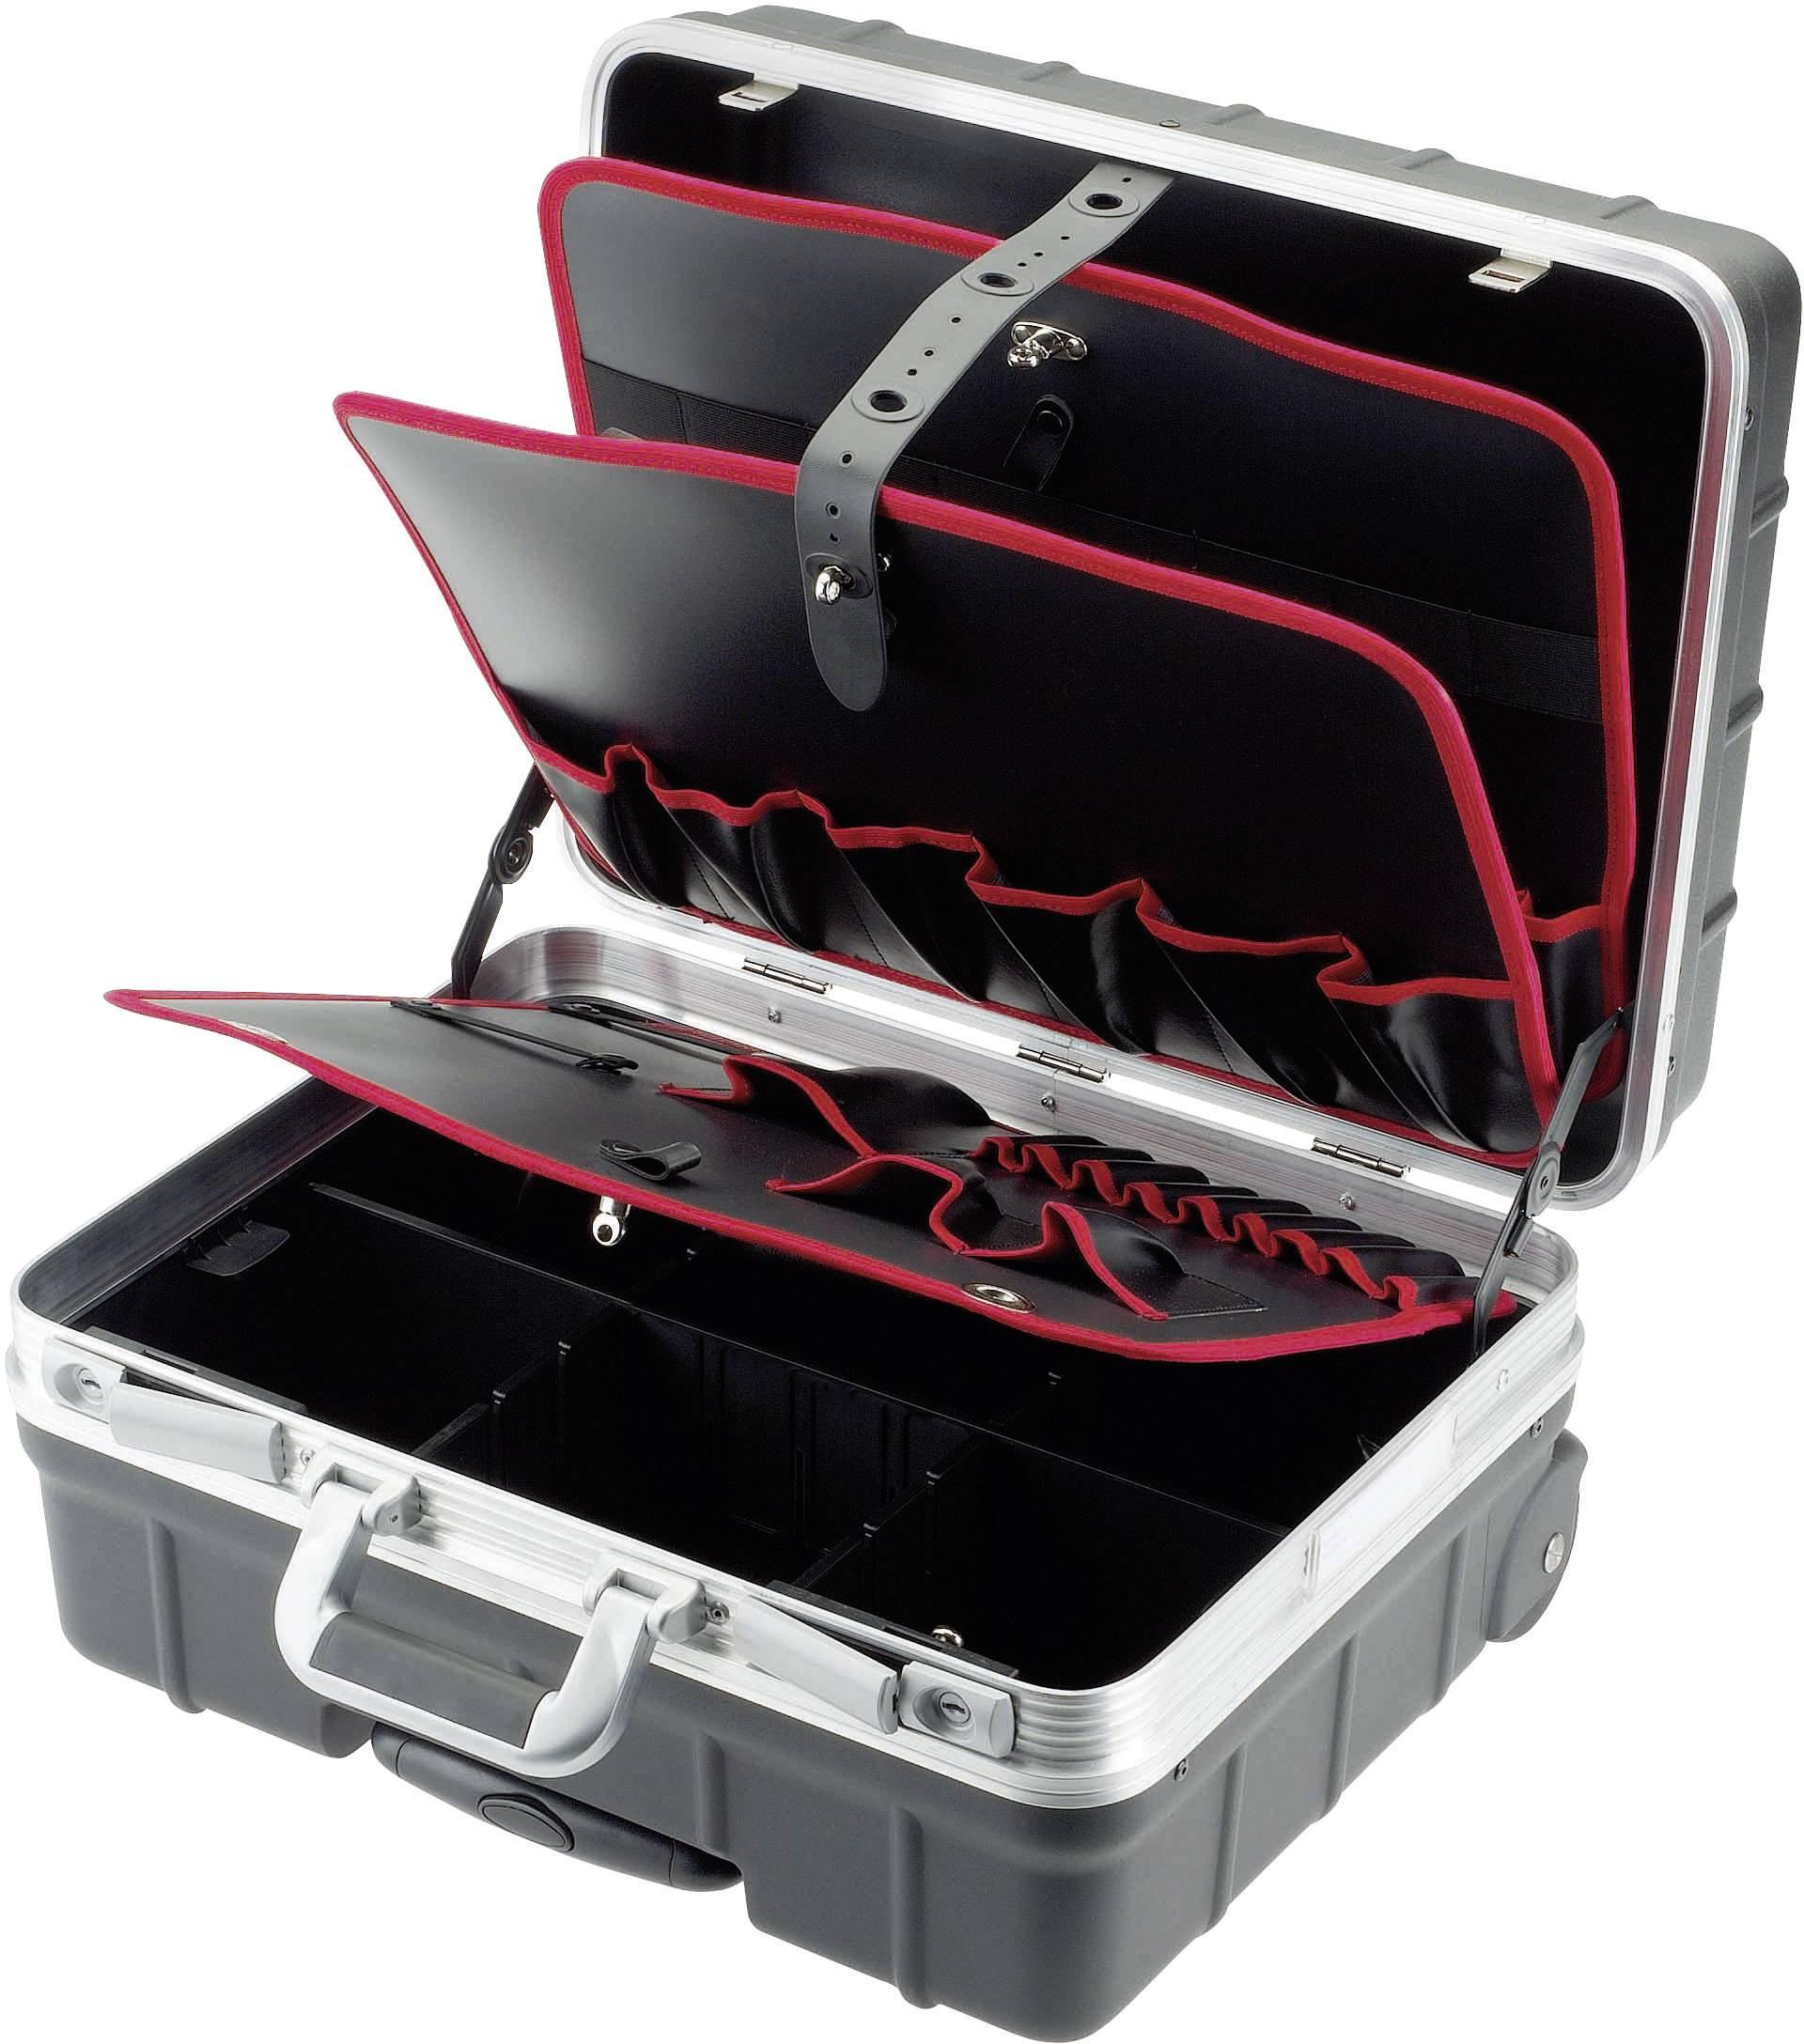 AEG LD6 10617 Kfz Ladegerät 6 V, 12 V 3 A 6 A kaufen